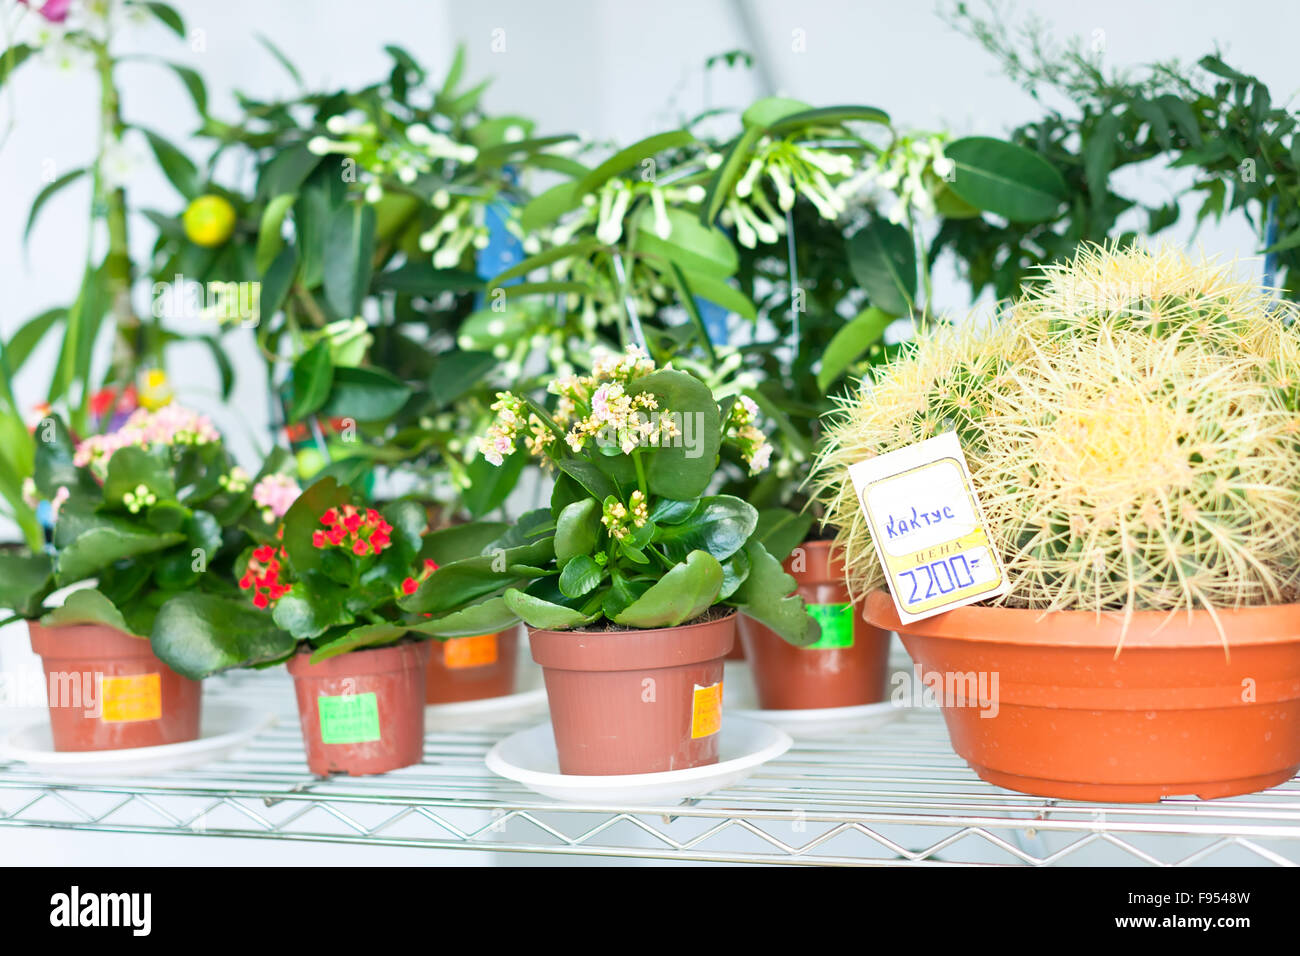 kalanchoe cactus stockfotos kalanchoe cactus bilder alamy. Black Bedroom Furniture Sets. Home Design Ideas